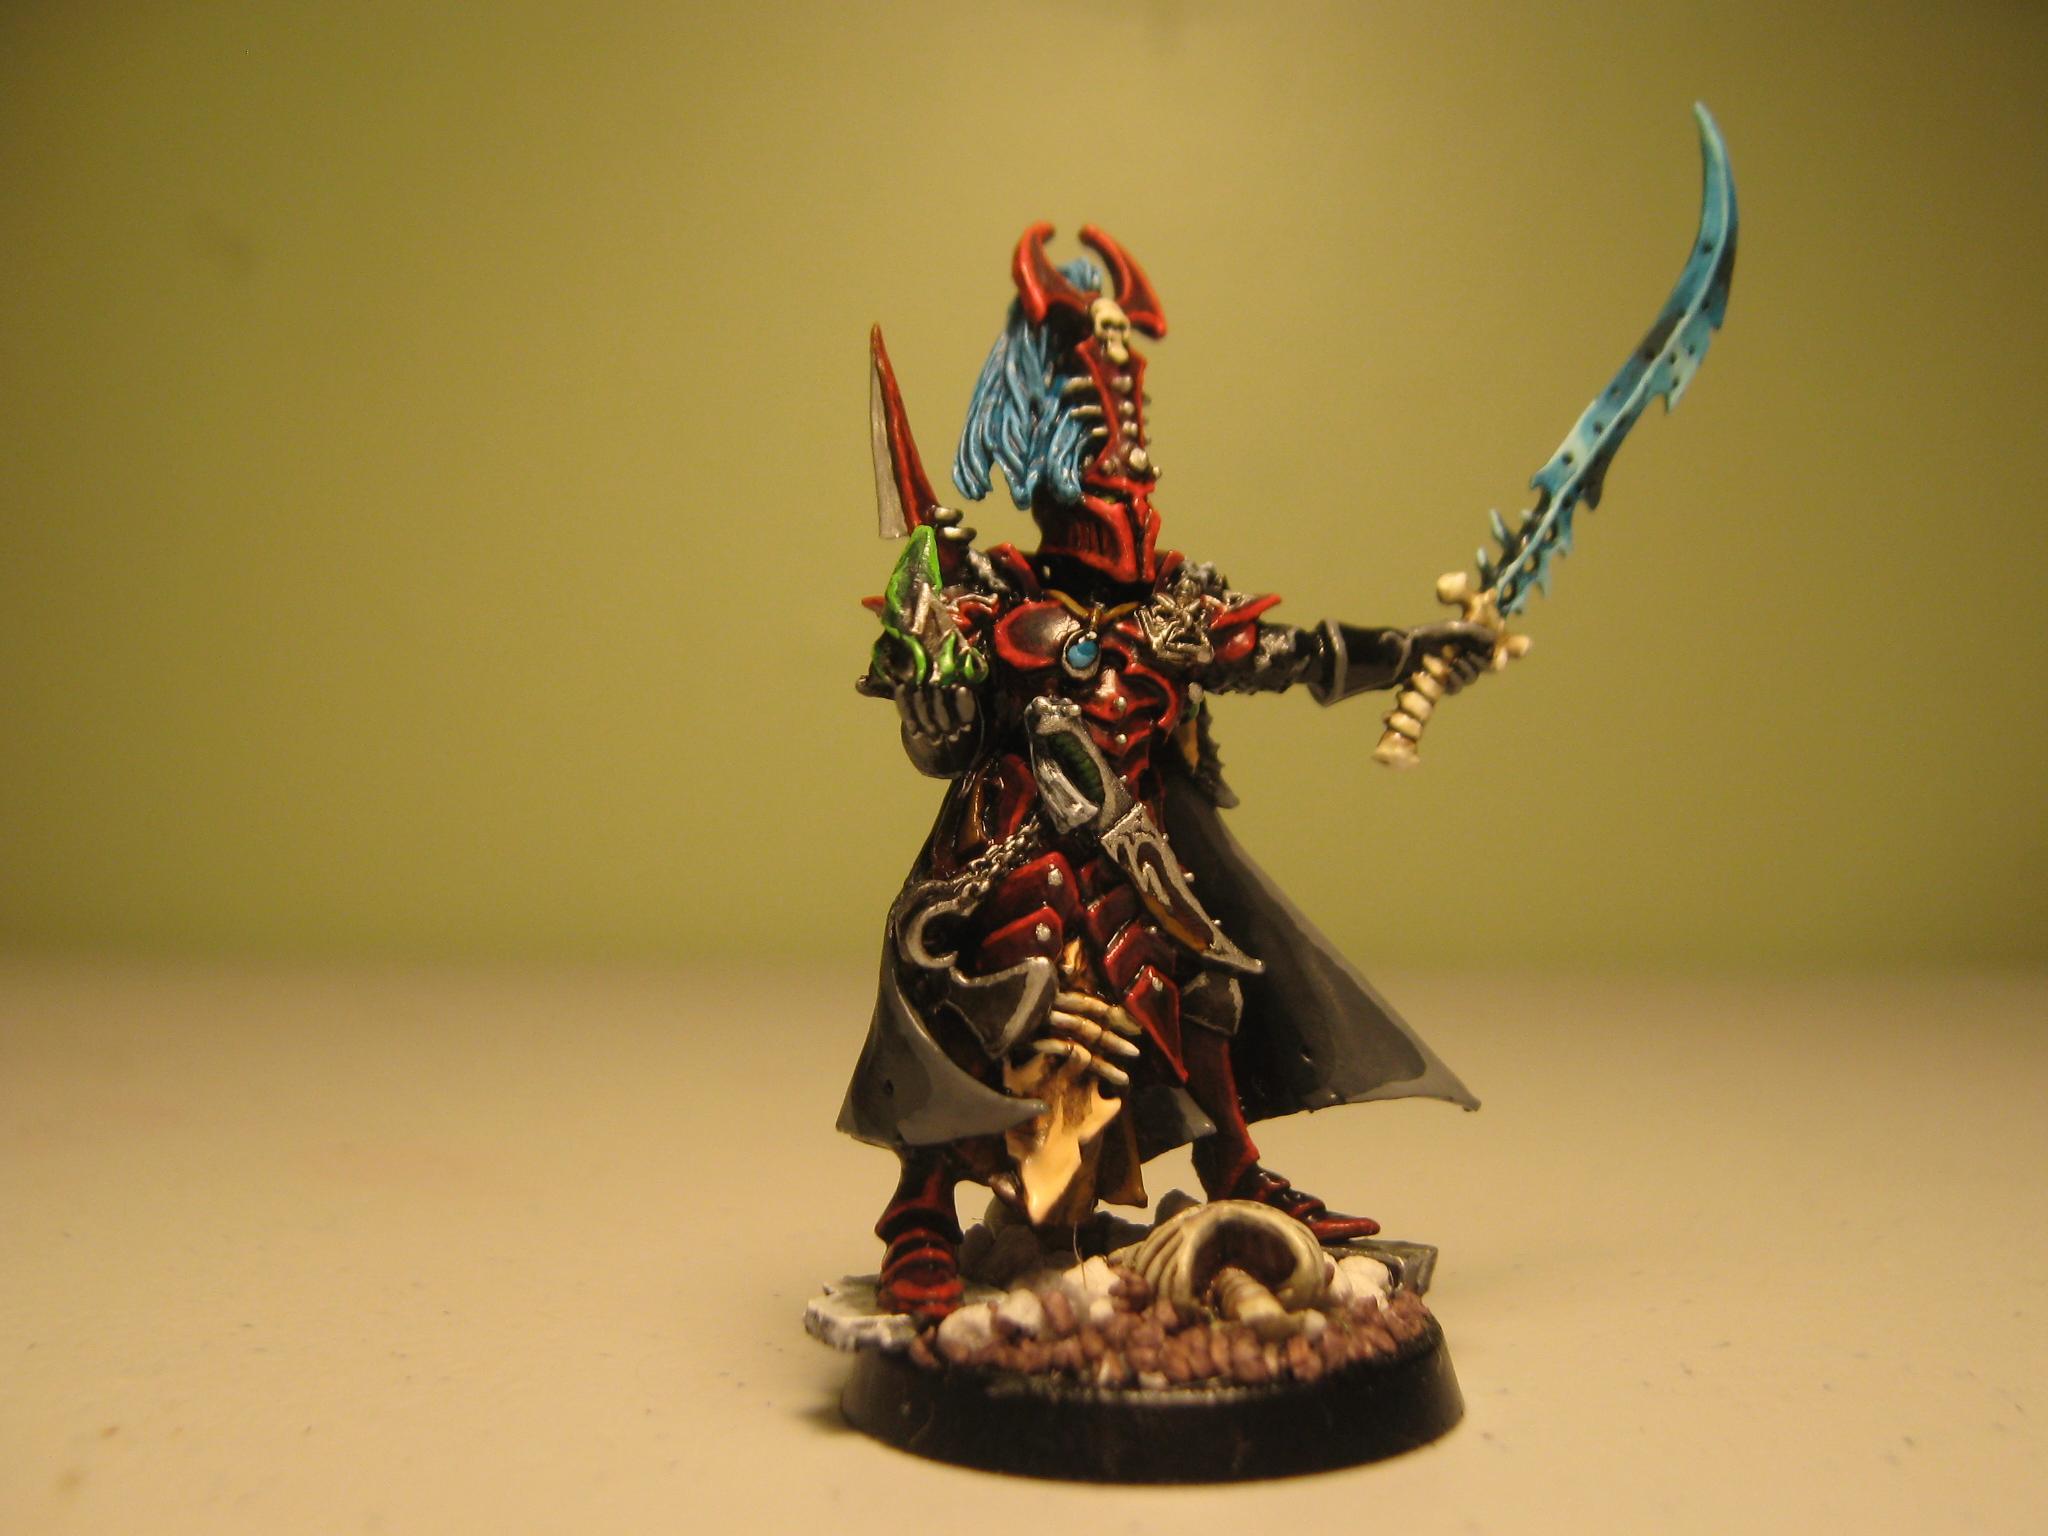 Archon, Commoragh, Dark Eldar, De, De Archon, Headquarters, Warhammer 40,000, Warriors